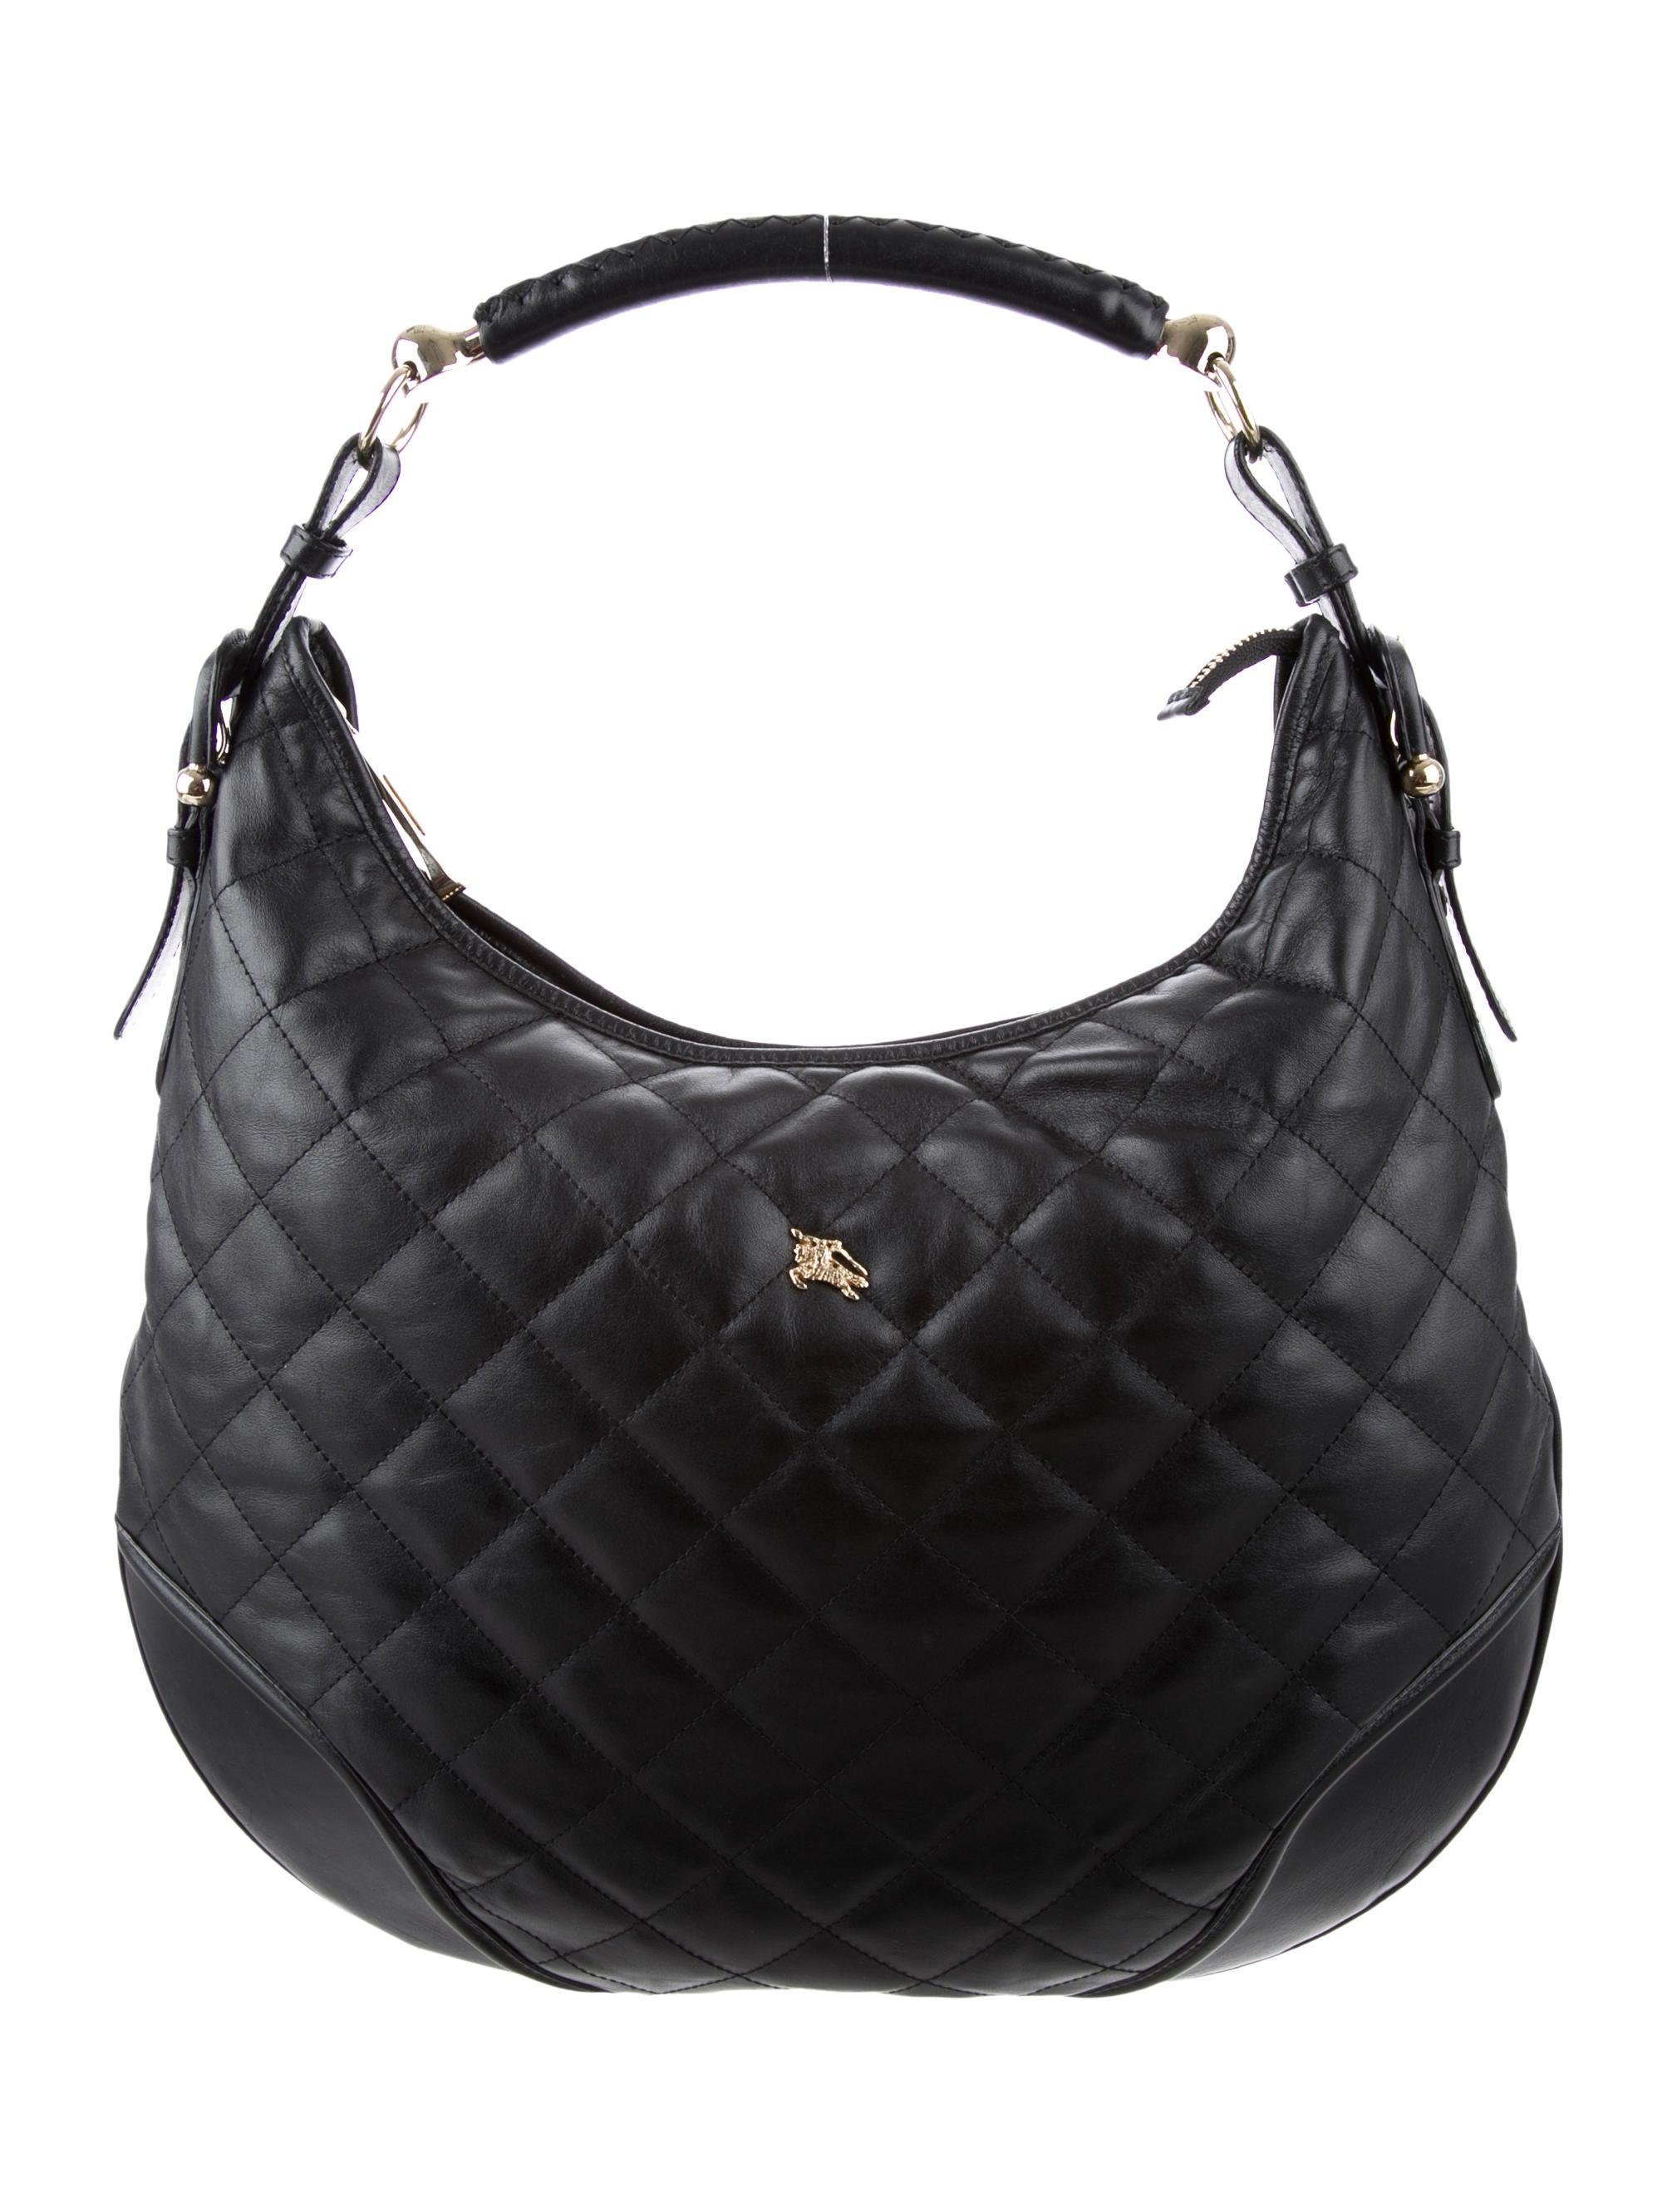 Burberry Hoxton Quilted Hobo - Handbags - BUR77060  ec91f9013c380